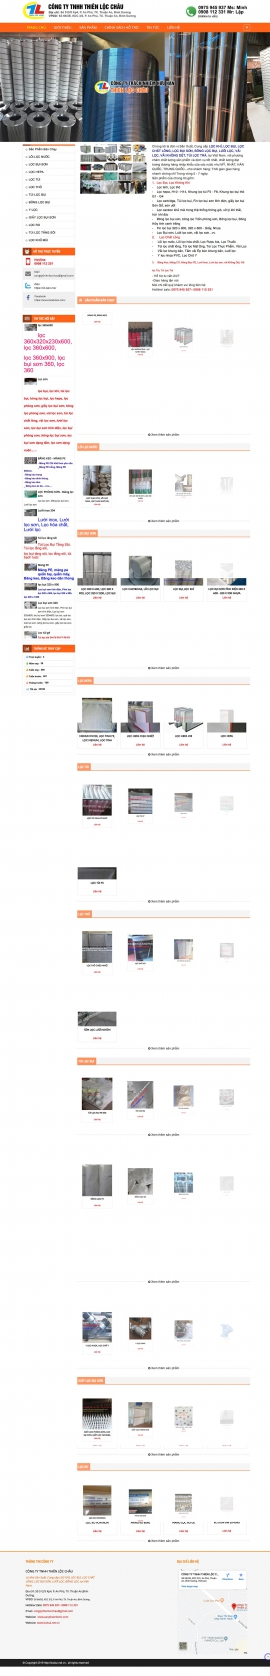 Mẫu website sản phẩm lọc 13503